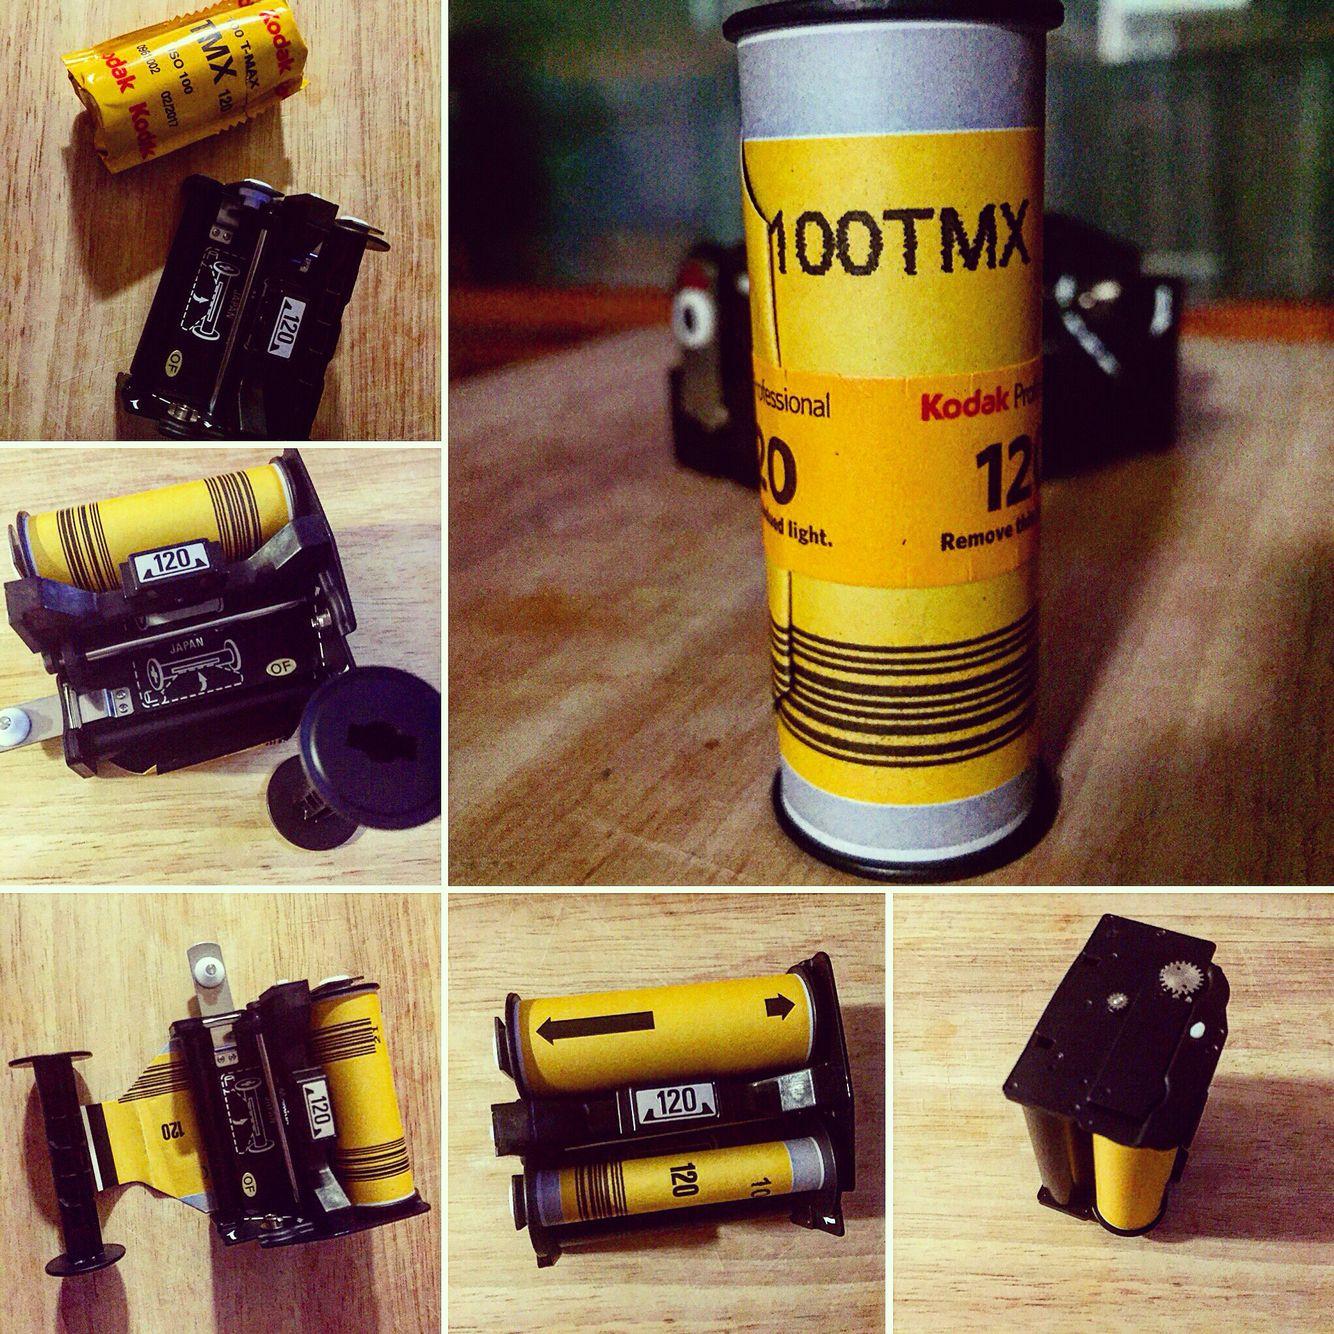 Loading Kodak TMX 120 film   Photography   Film photography tips